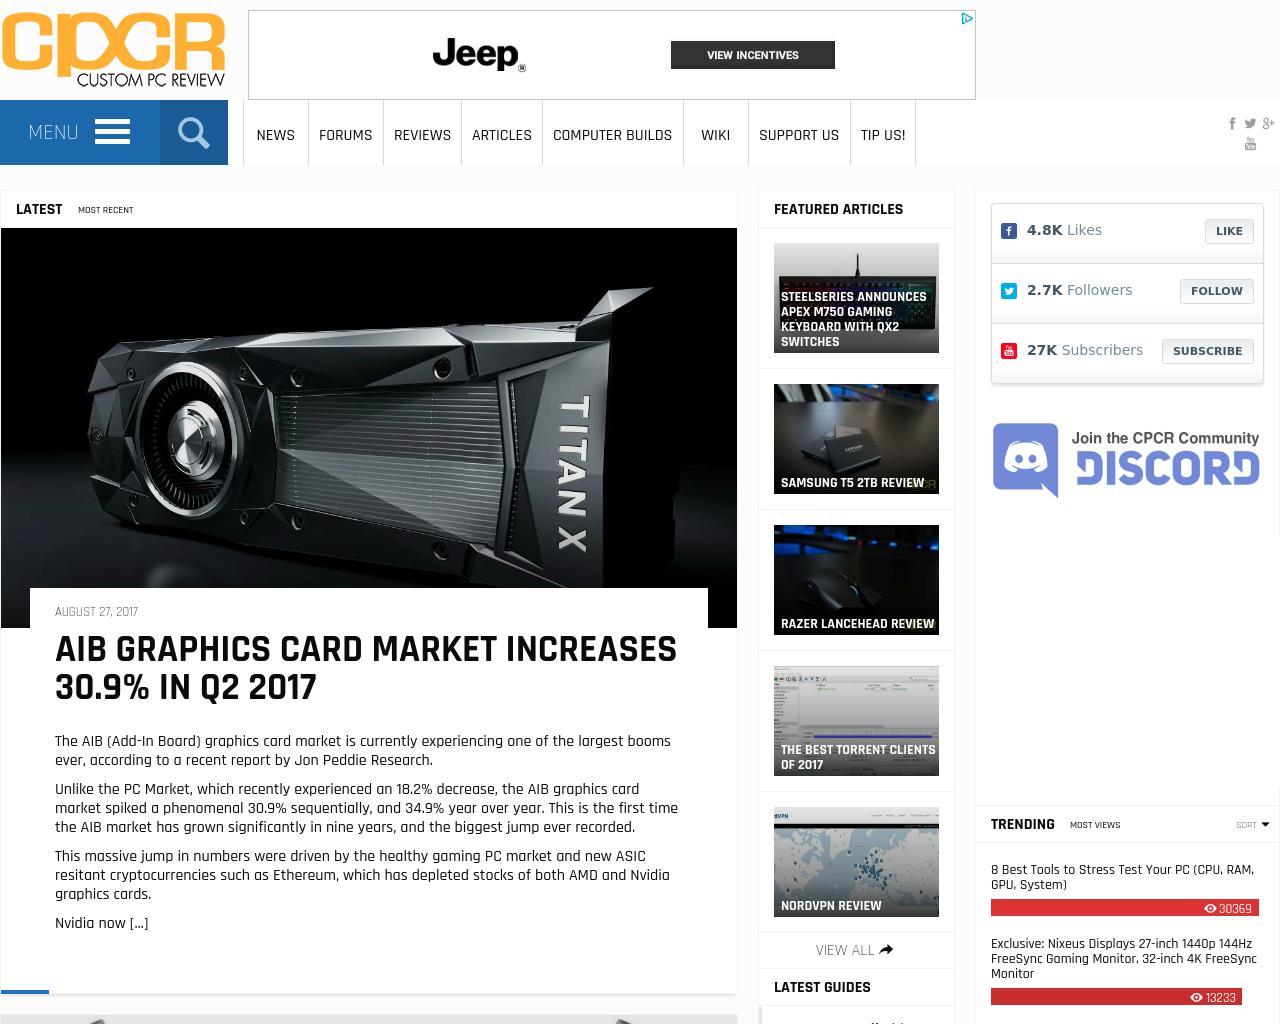 CPCR-Advertising-Reviews-Pricing